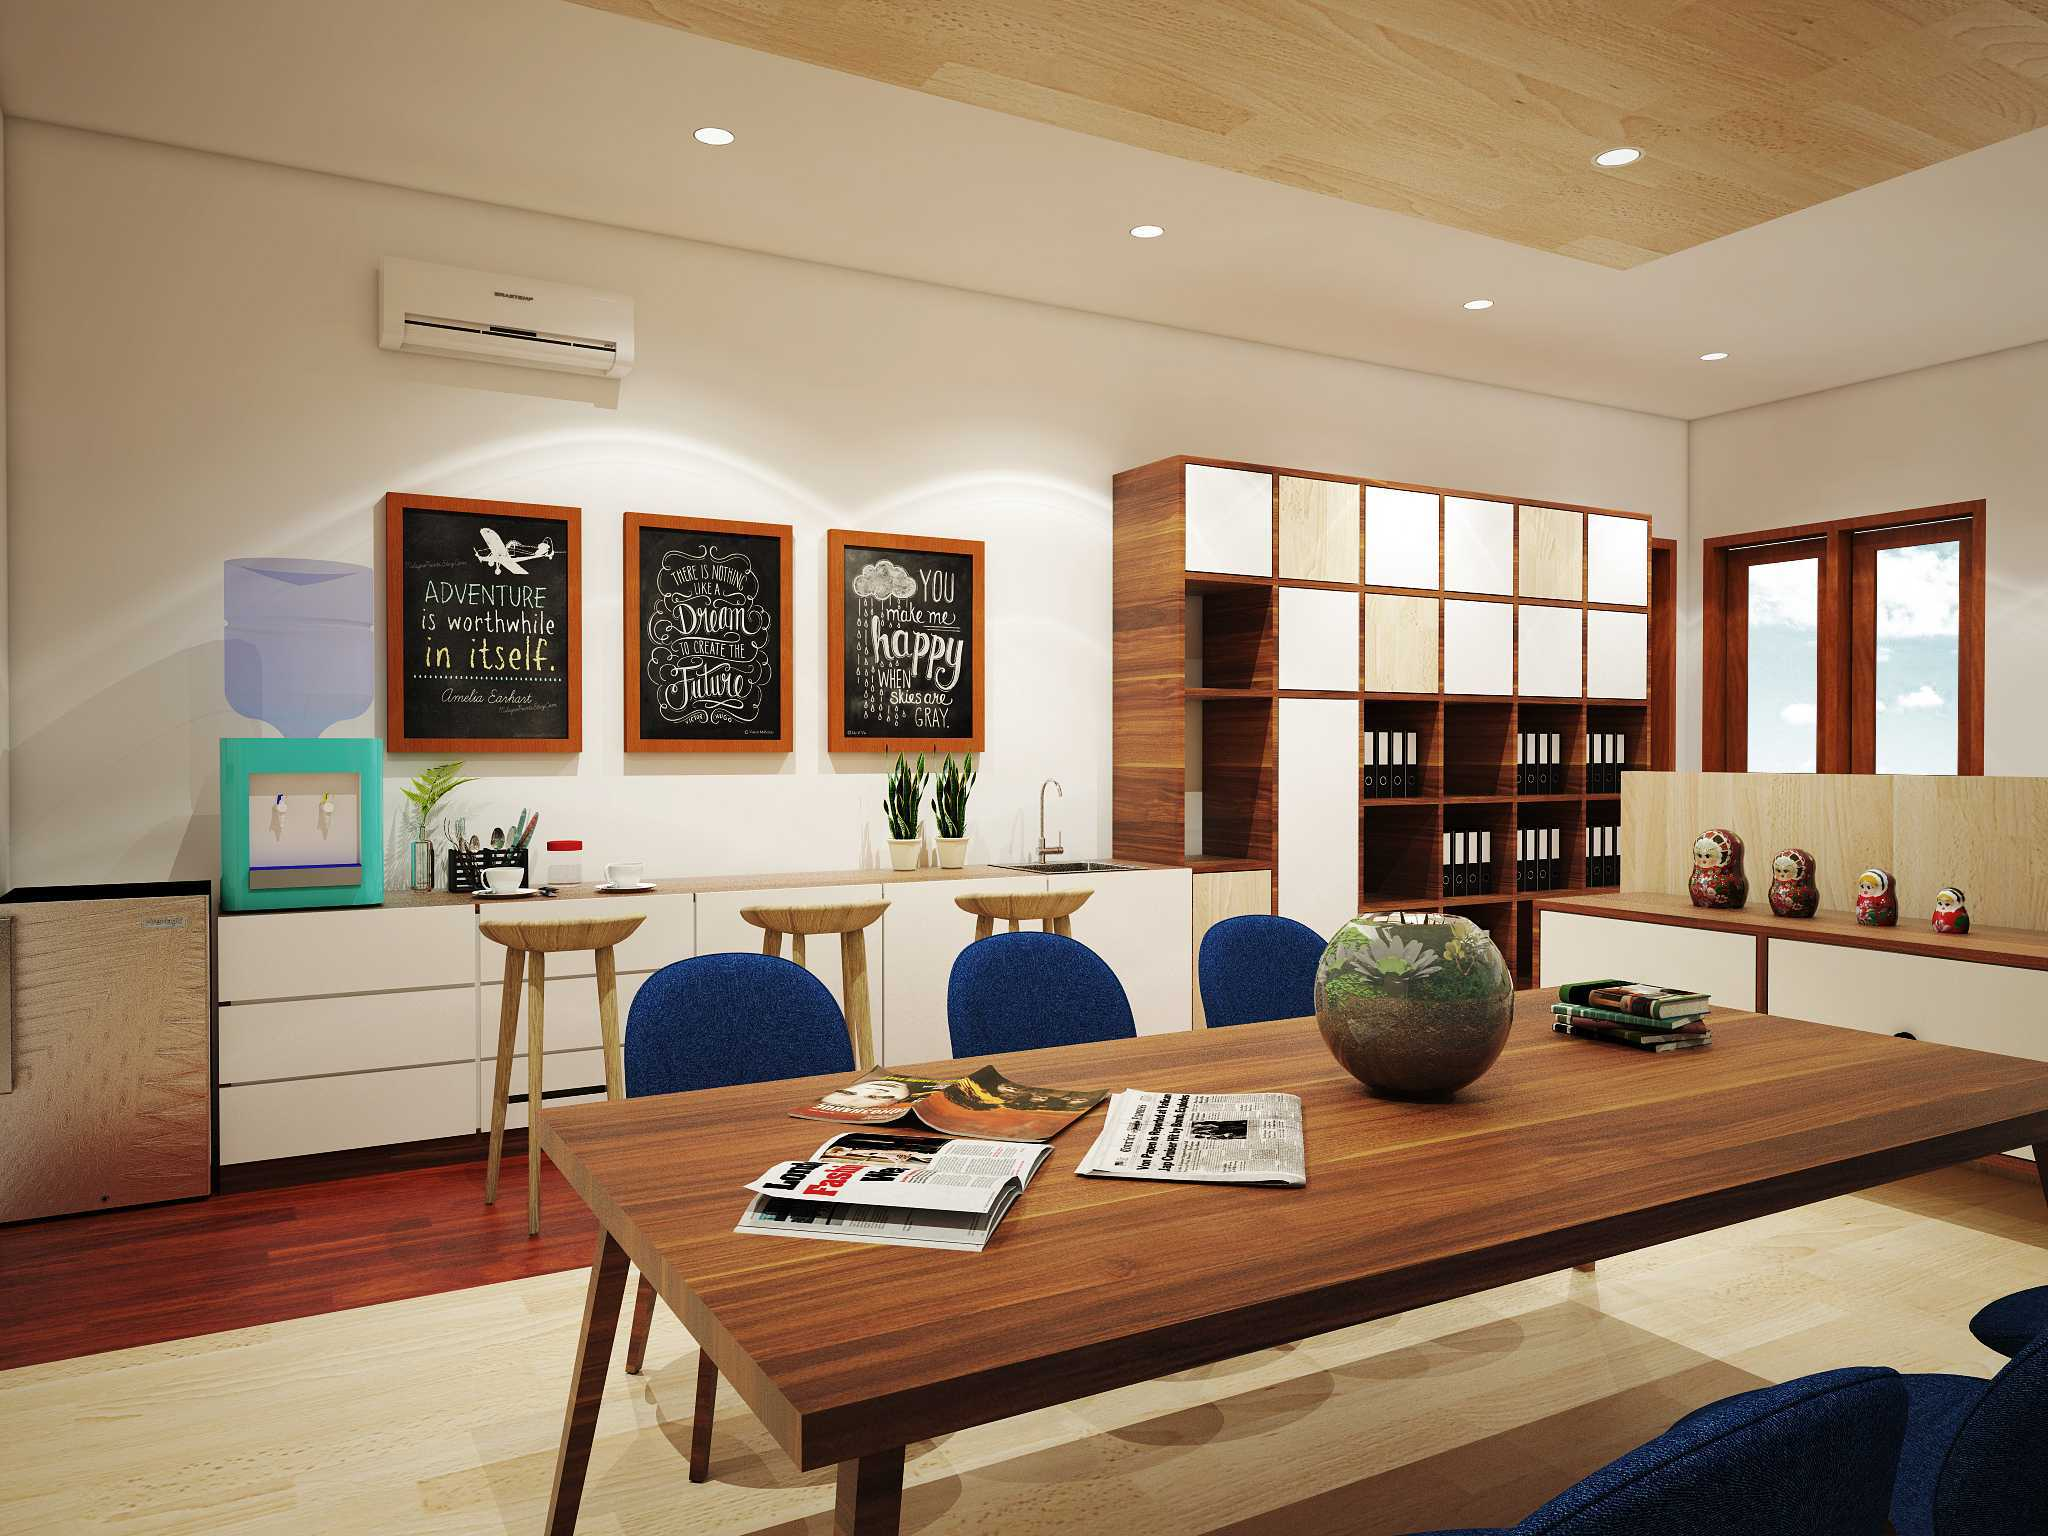 Sekala Jasko Office Kertajaya, Gubeng, Kota Sby, Jawa Timur, Indonesia Kertajaya, Gubeng, Kota Sby, Jawa Timur, Indonesia Interior Office Modern  38218